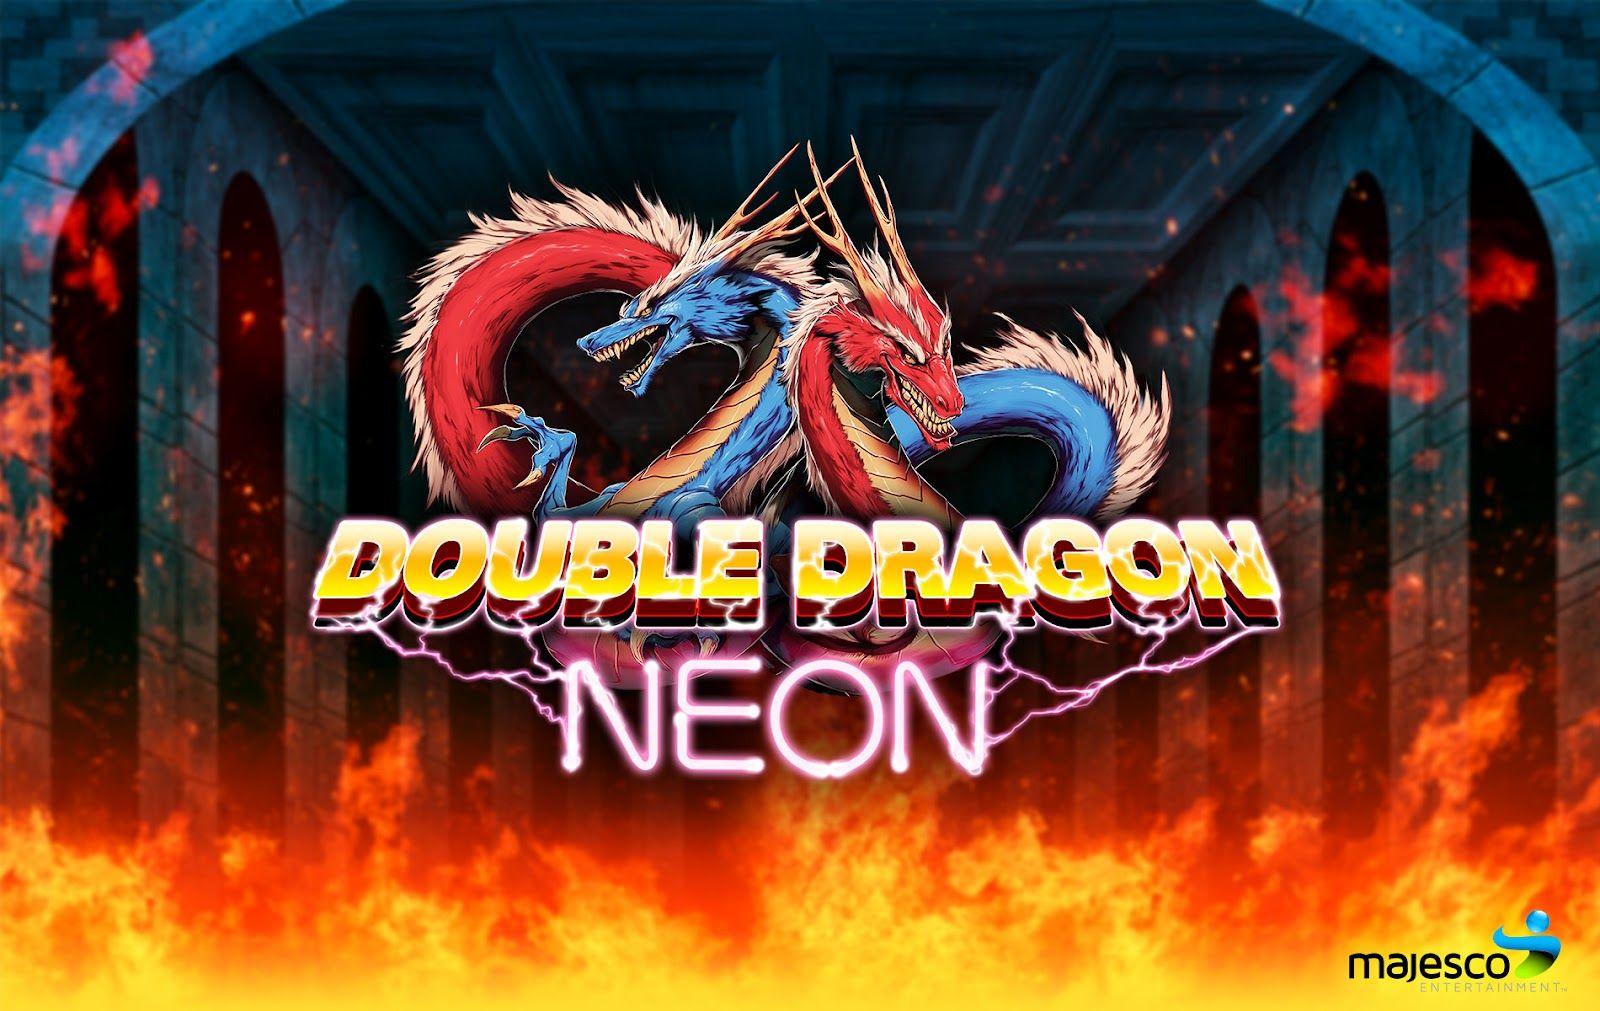 Double Dragon Neon Wallpaper Google Search Neon Neon Wallpaper Dragon